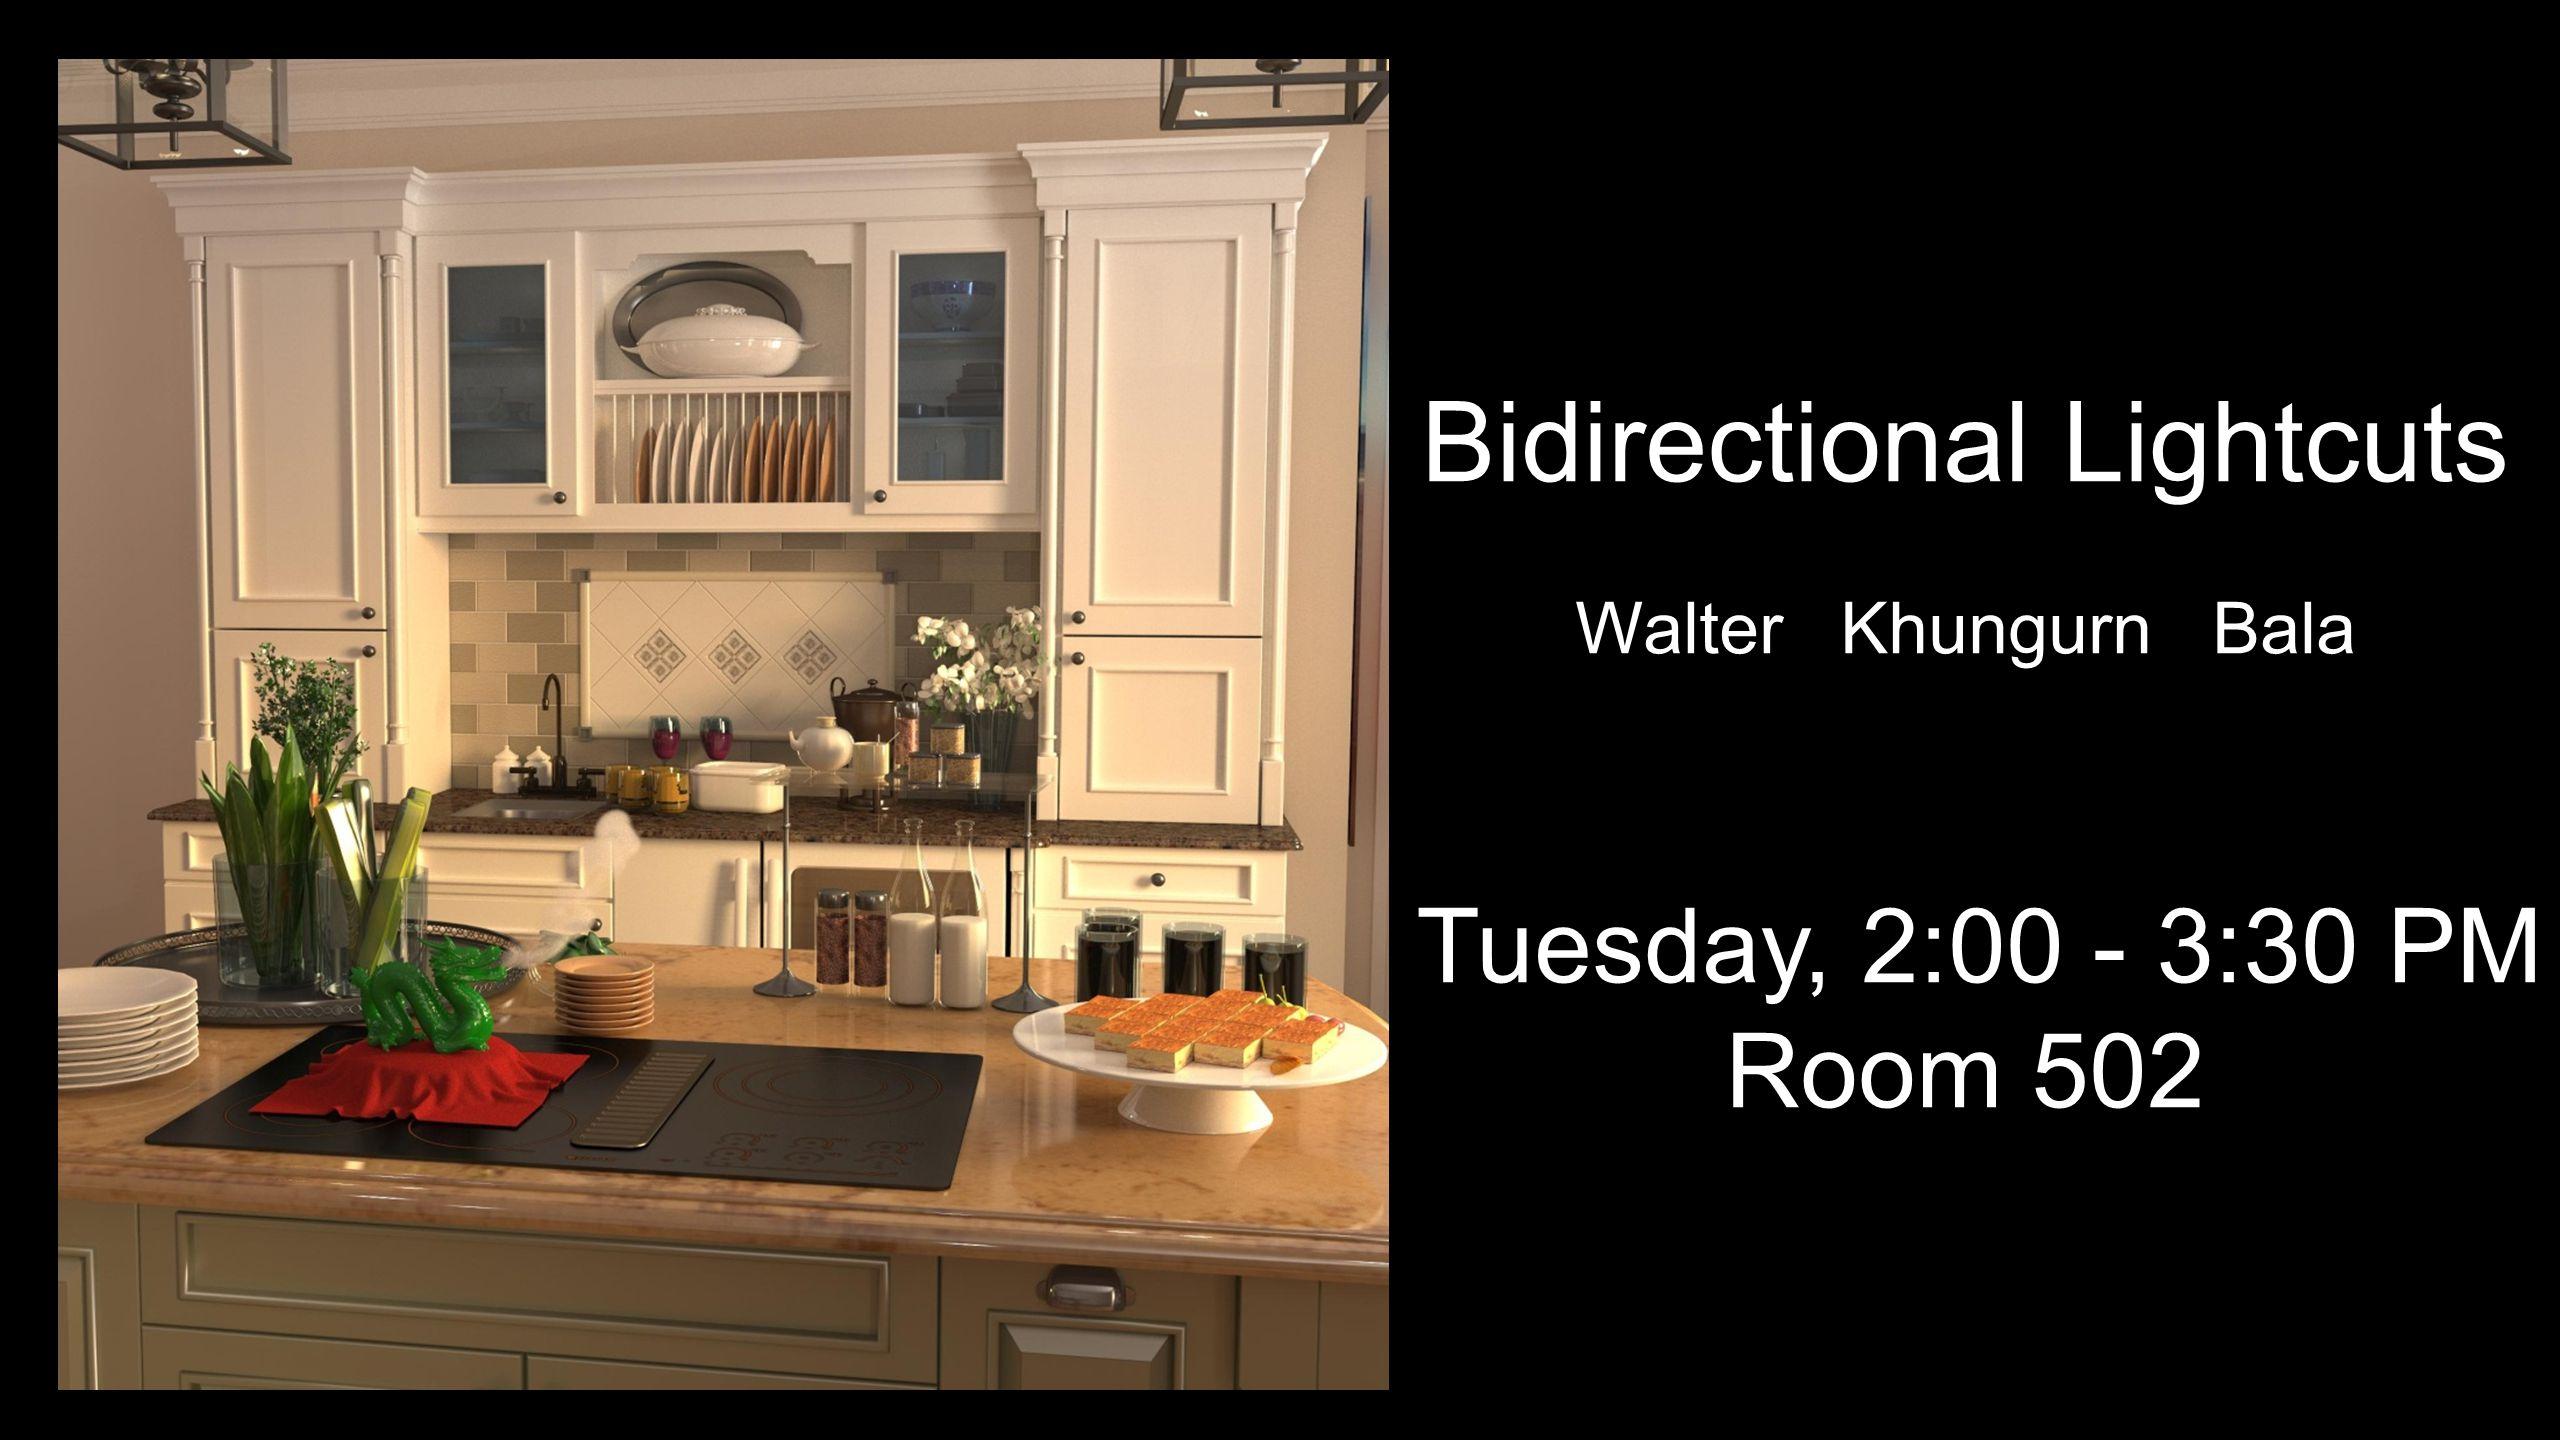 Bidirectional Lightcuts Walter Khungurn Bala Tuesday, 2:00 - 3:30 PM Room 502